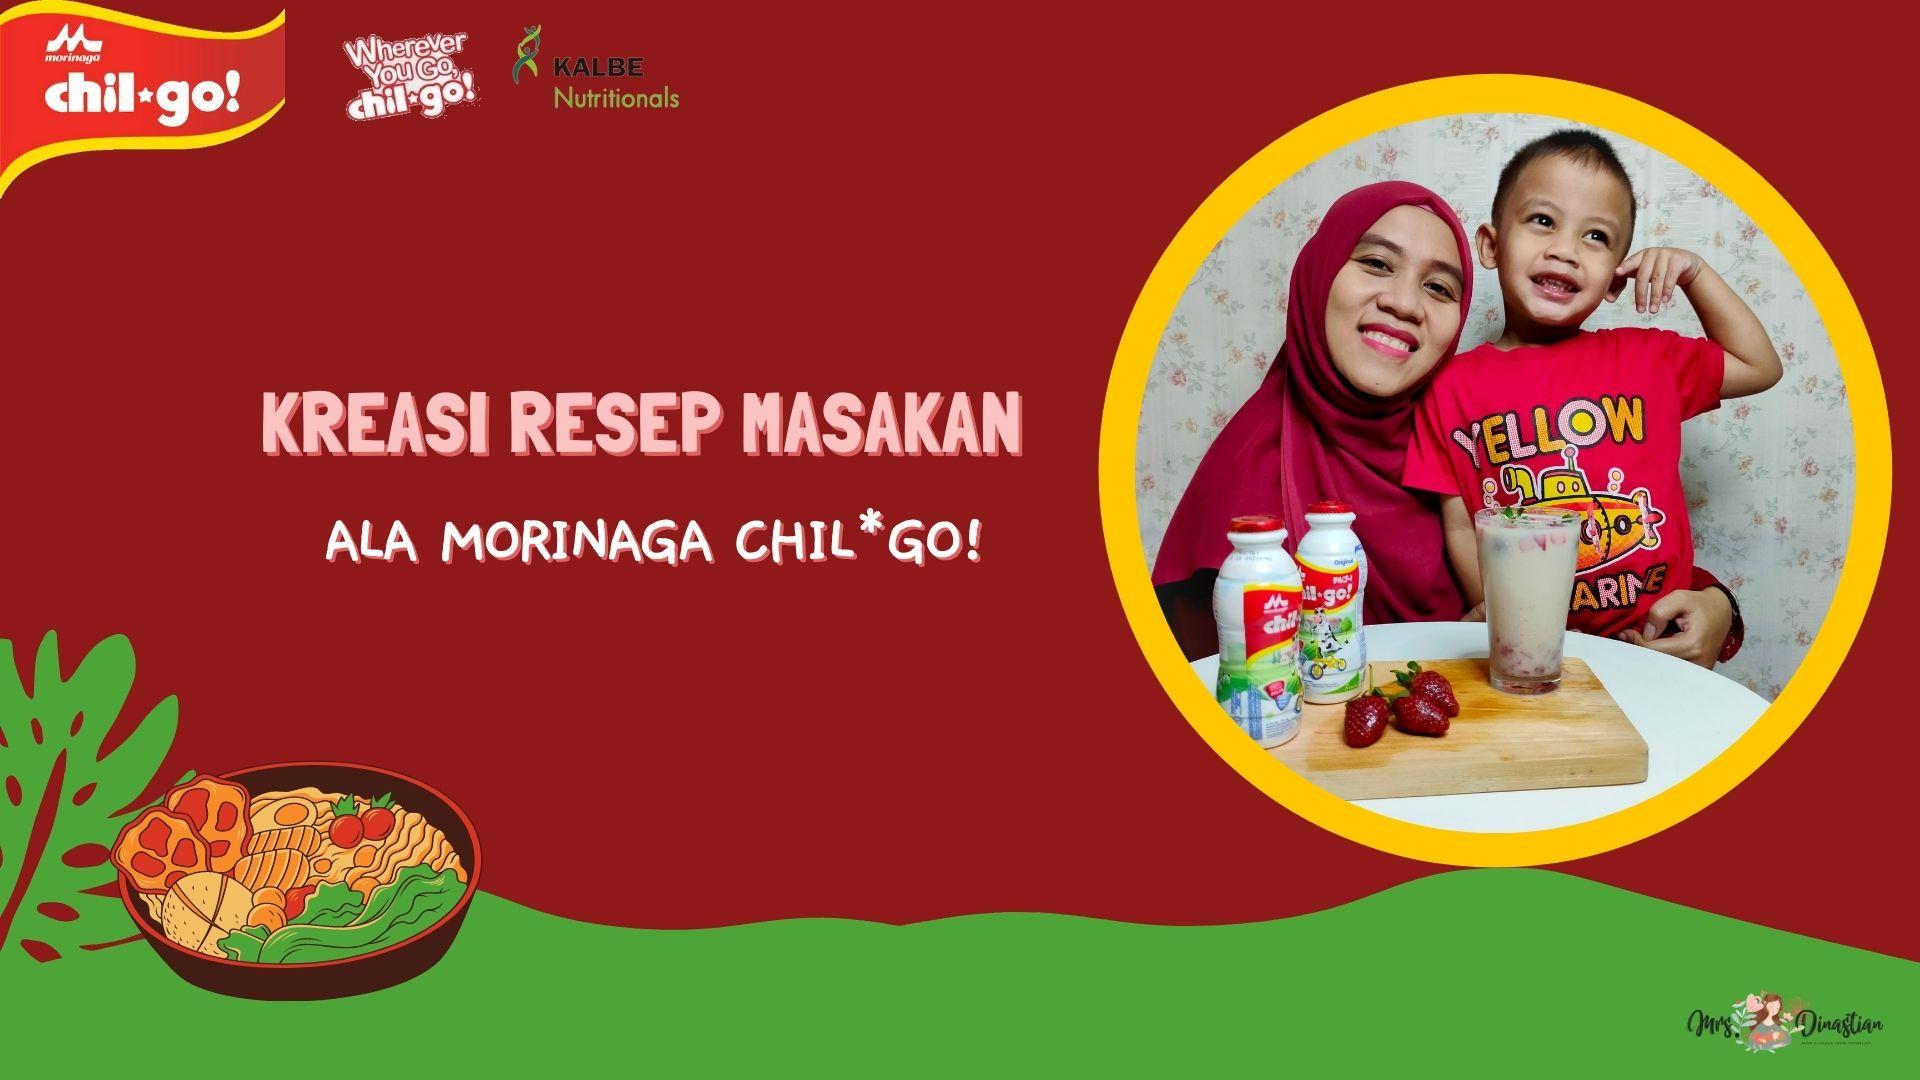 Kreasi Resep Masakan Morinaga Chil*Go!